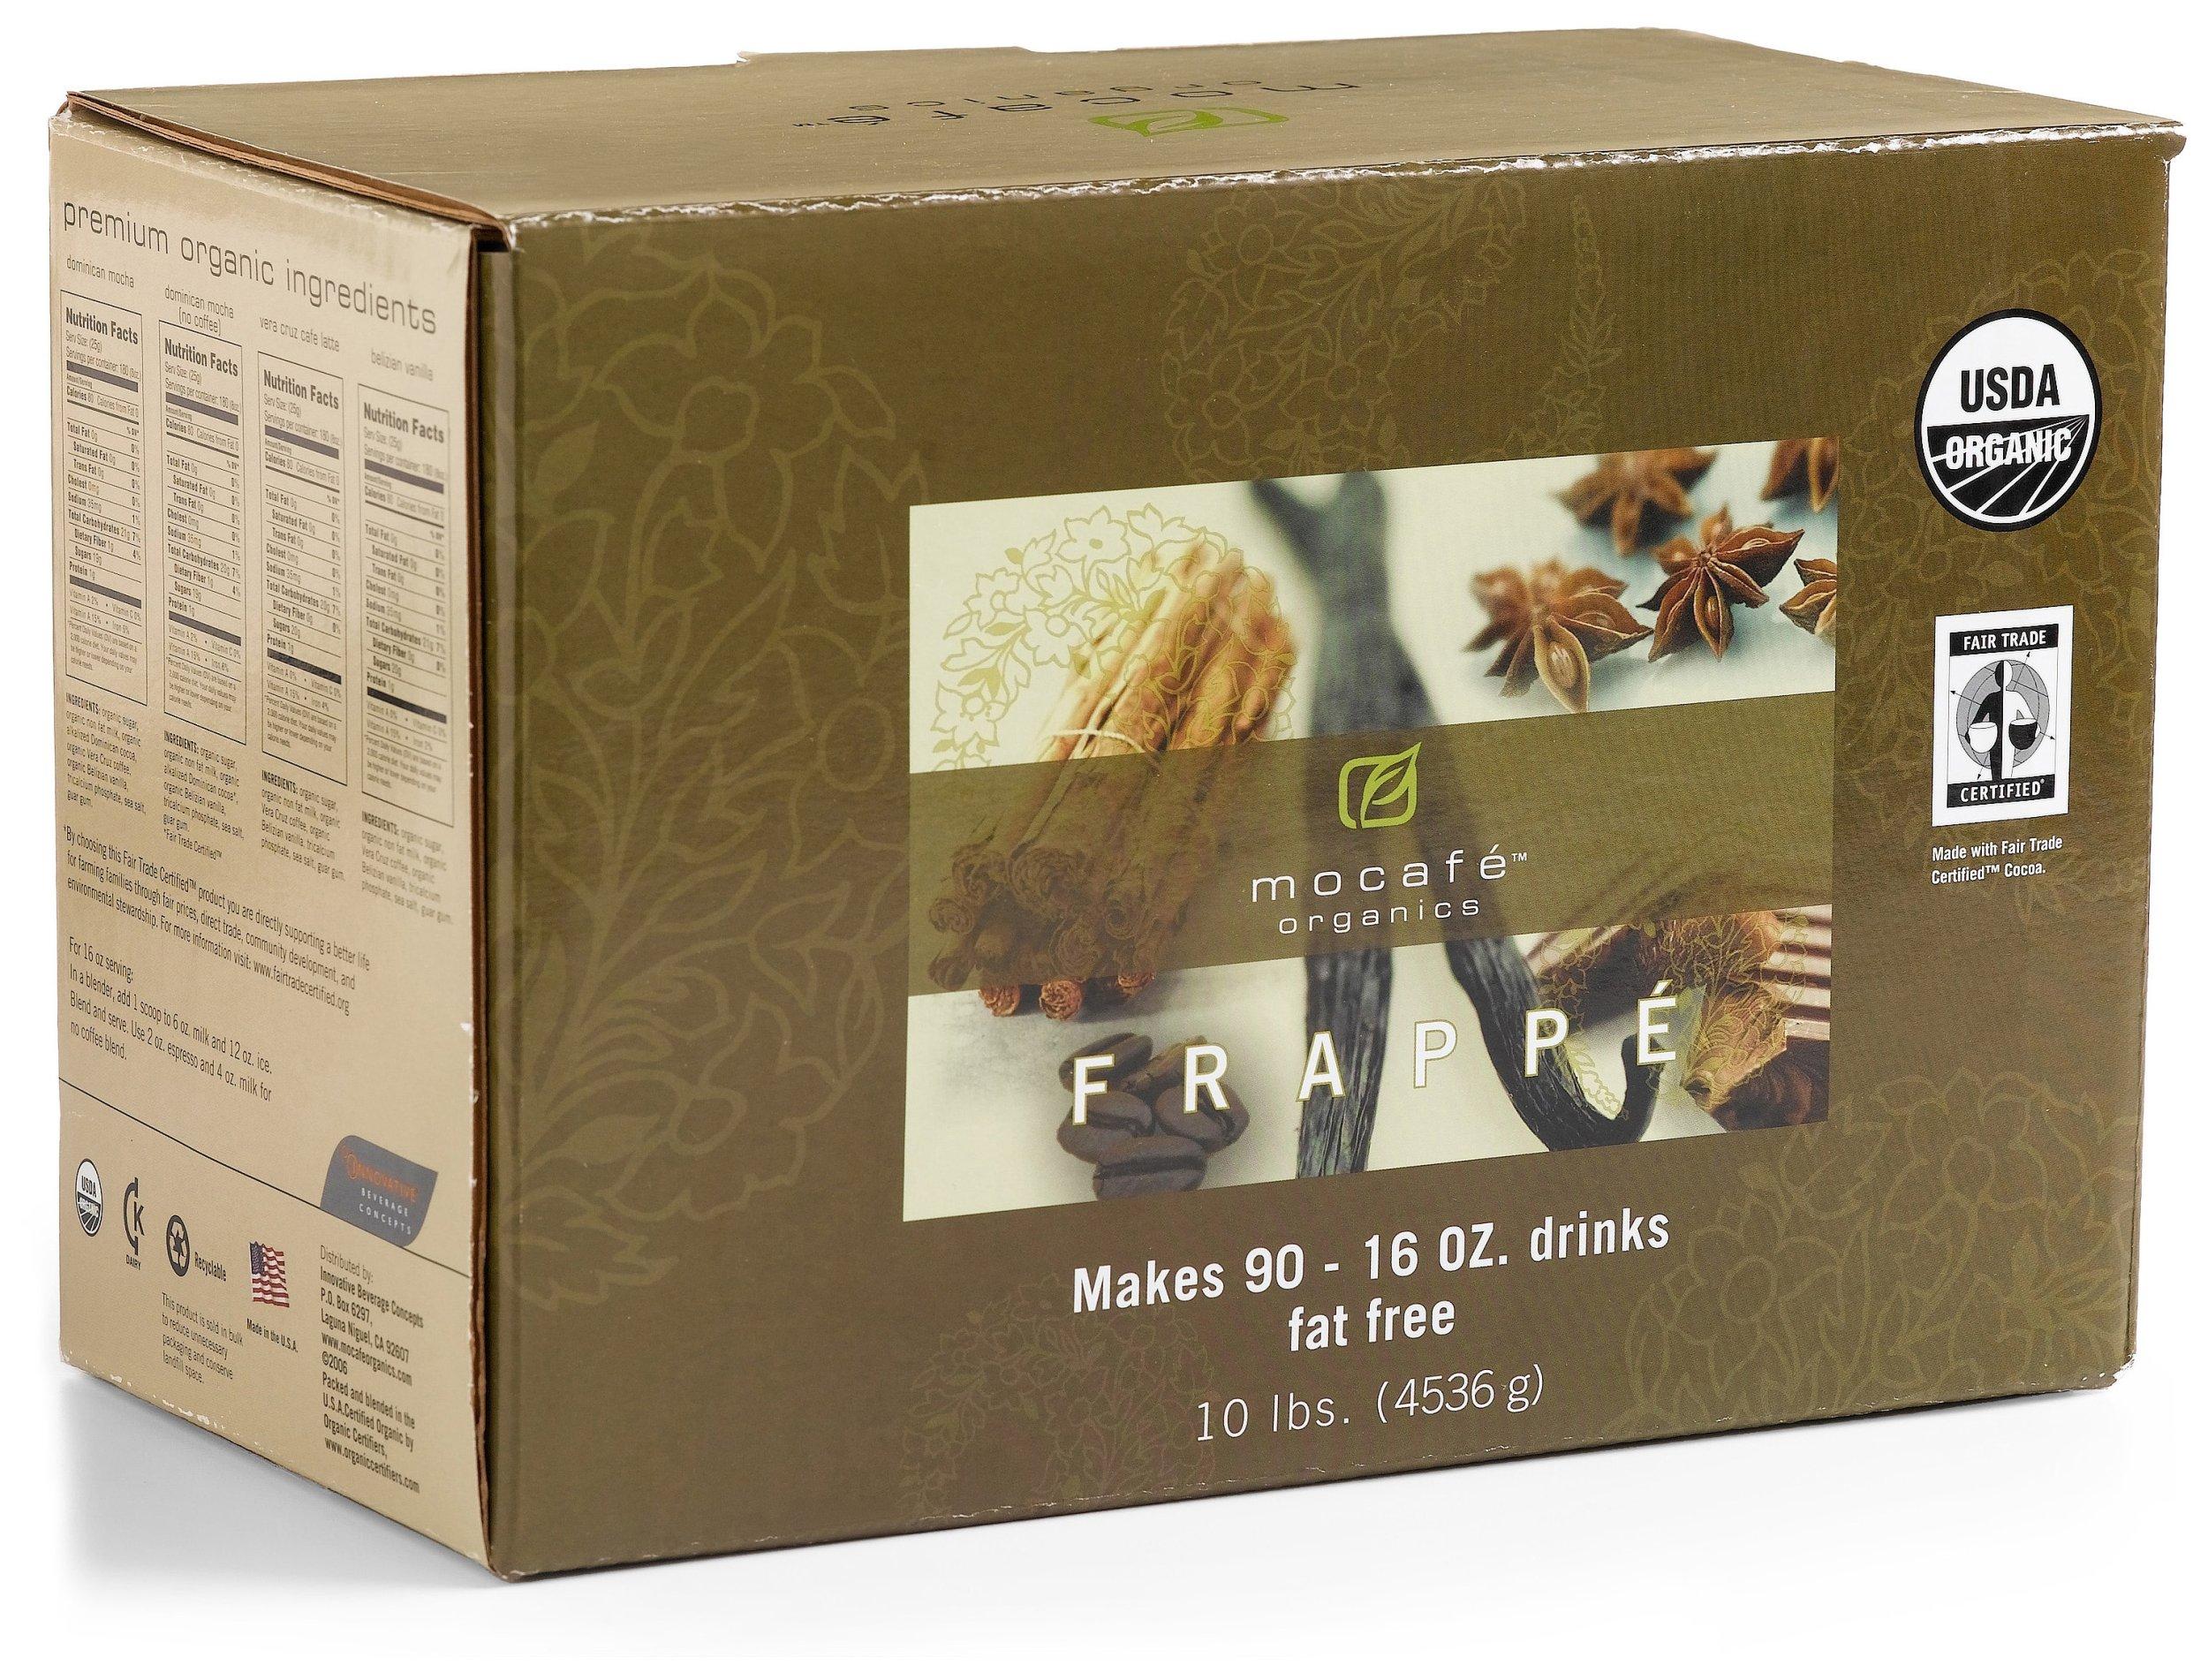 MOCAFE Organics Belizian Vanilla Latte Frappe, 10-Pound Box